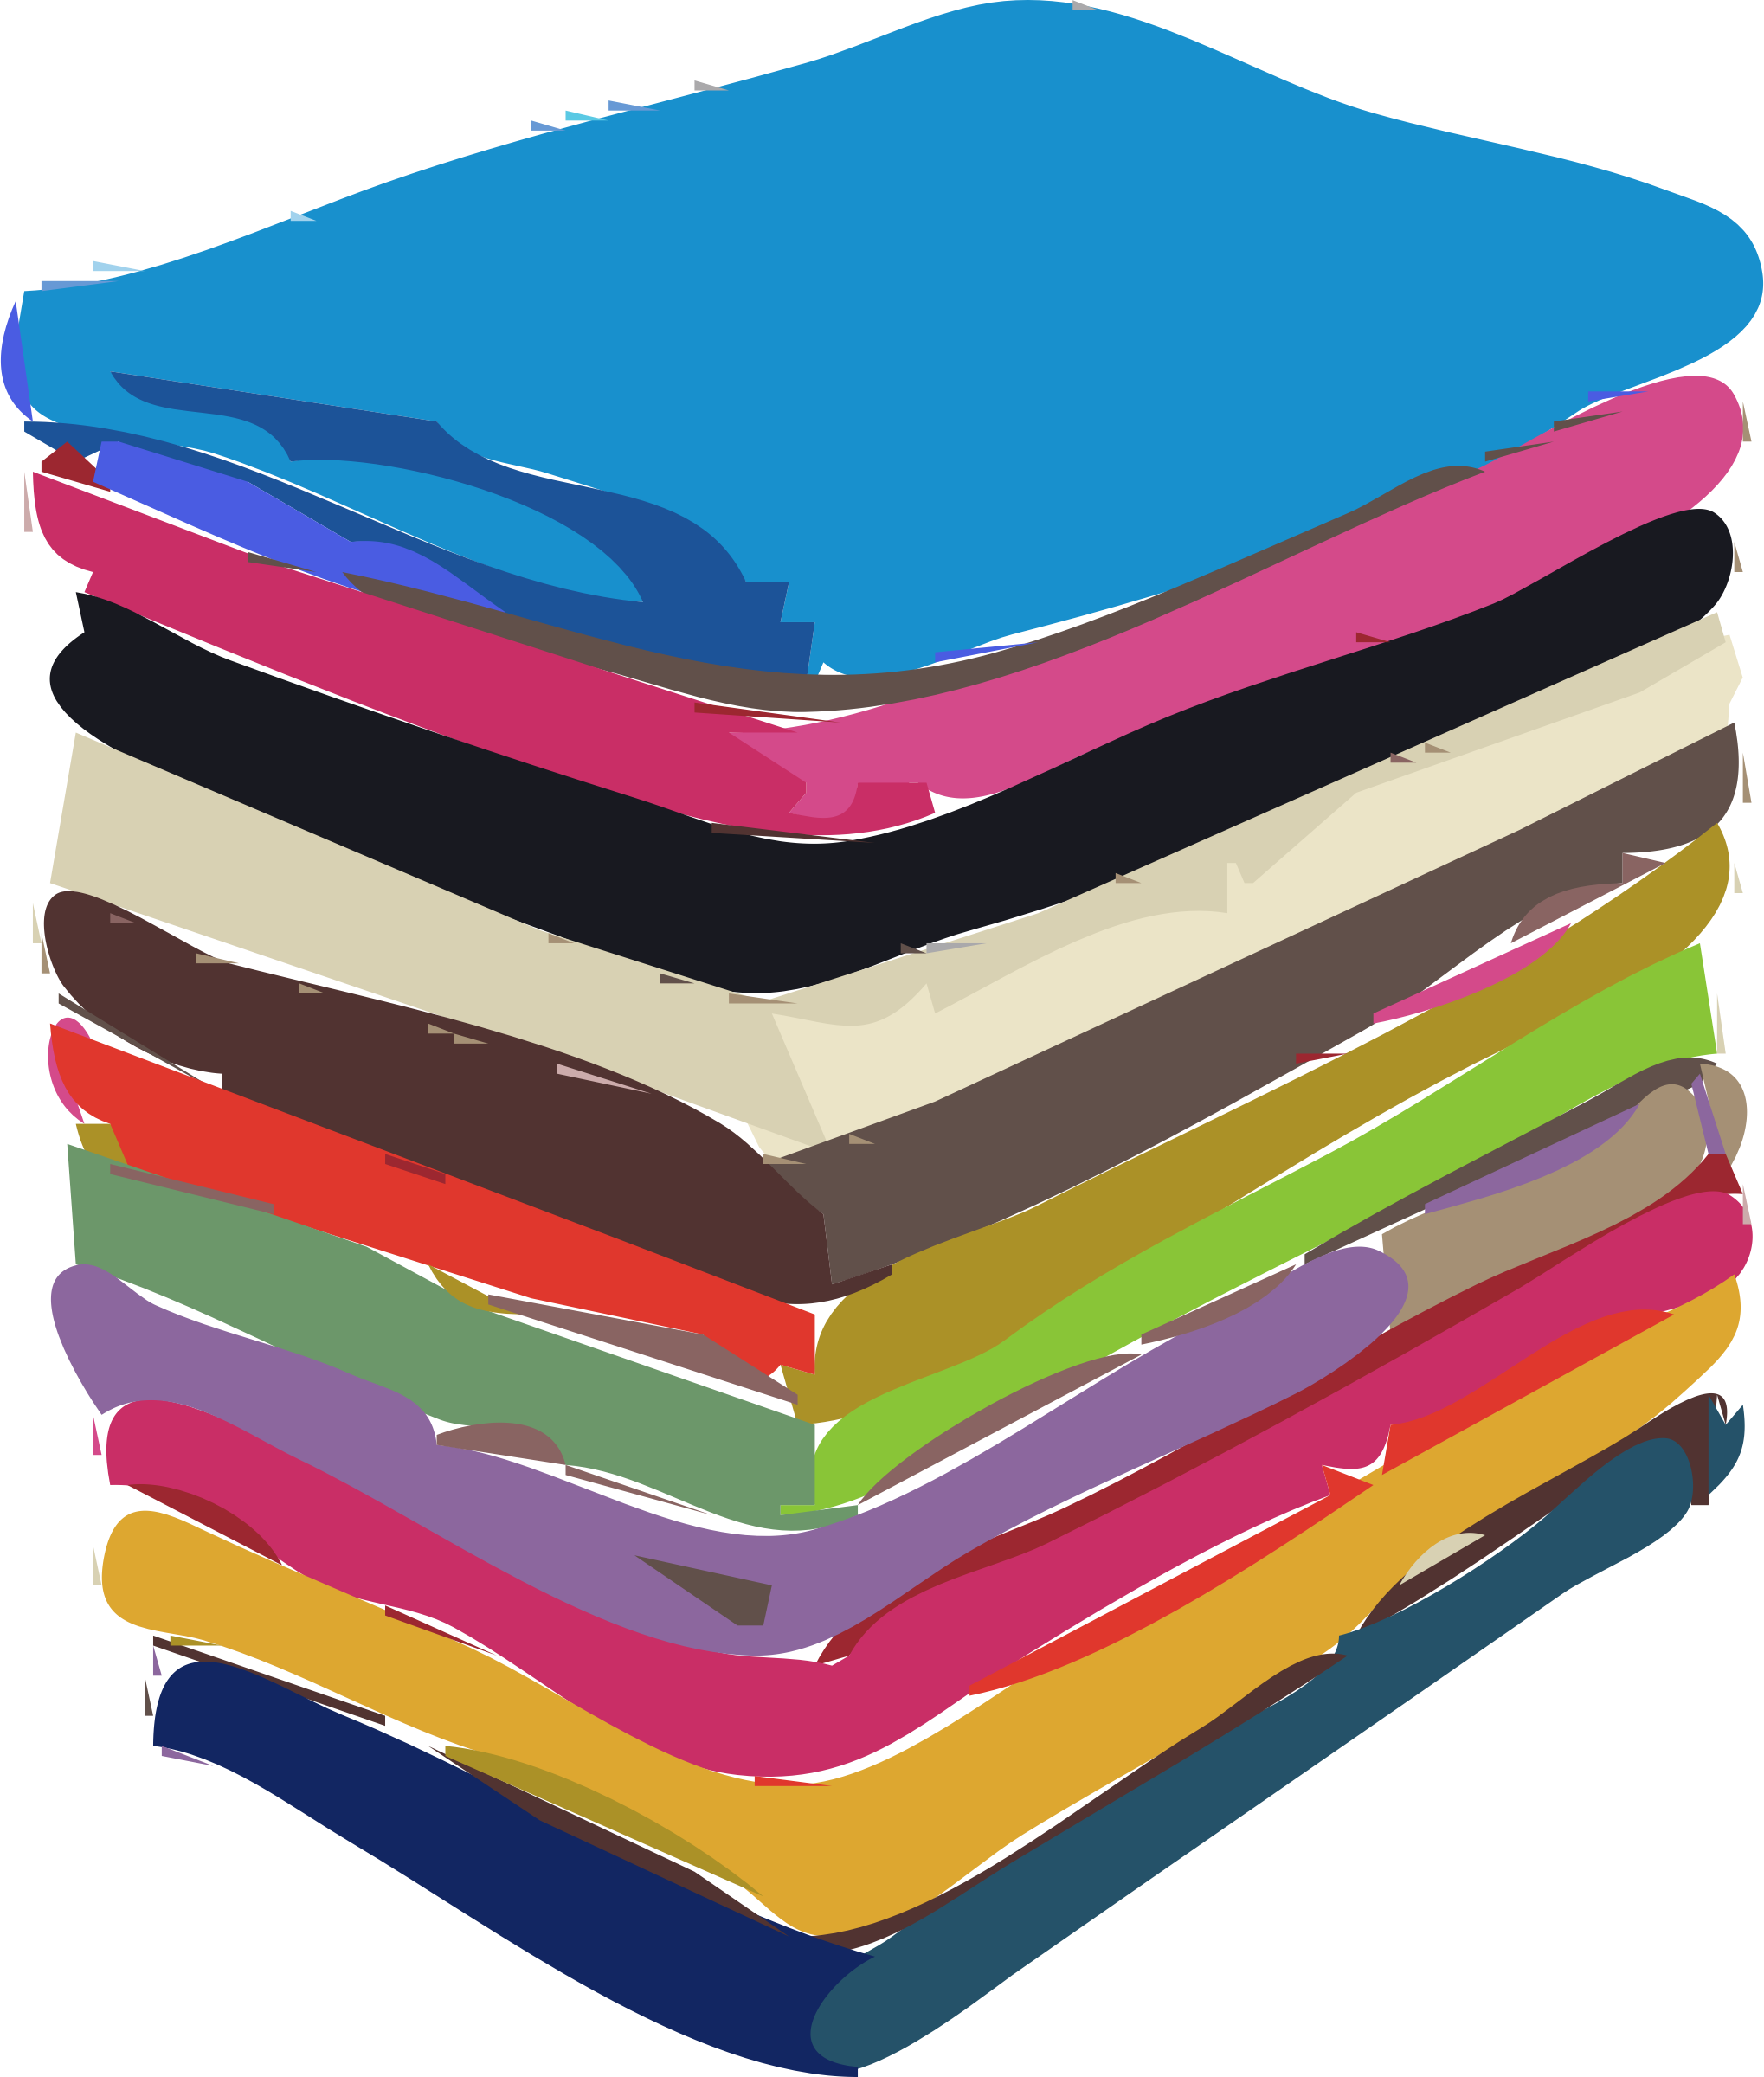 Rainbow towels big image. Napkin clipart folded napkin